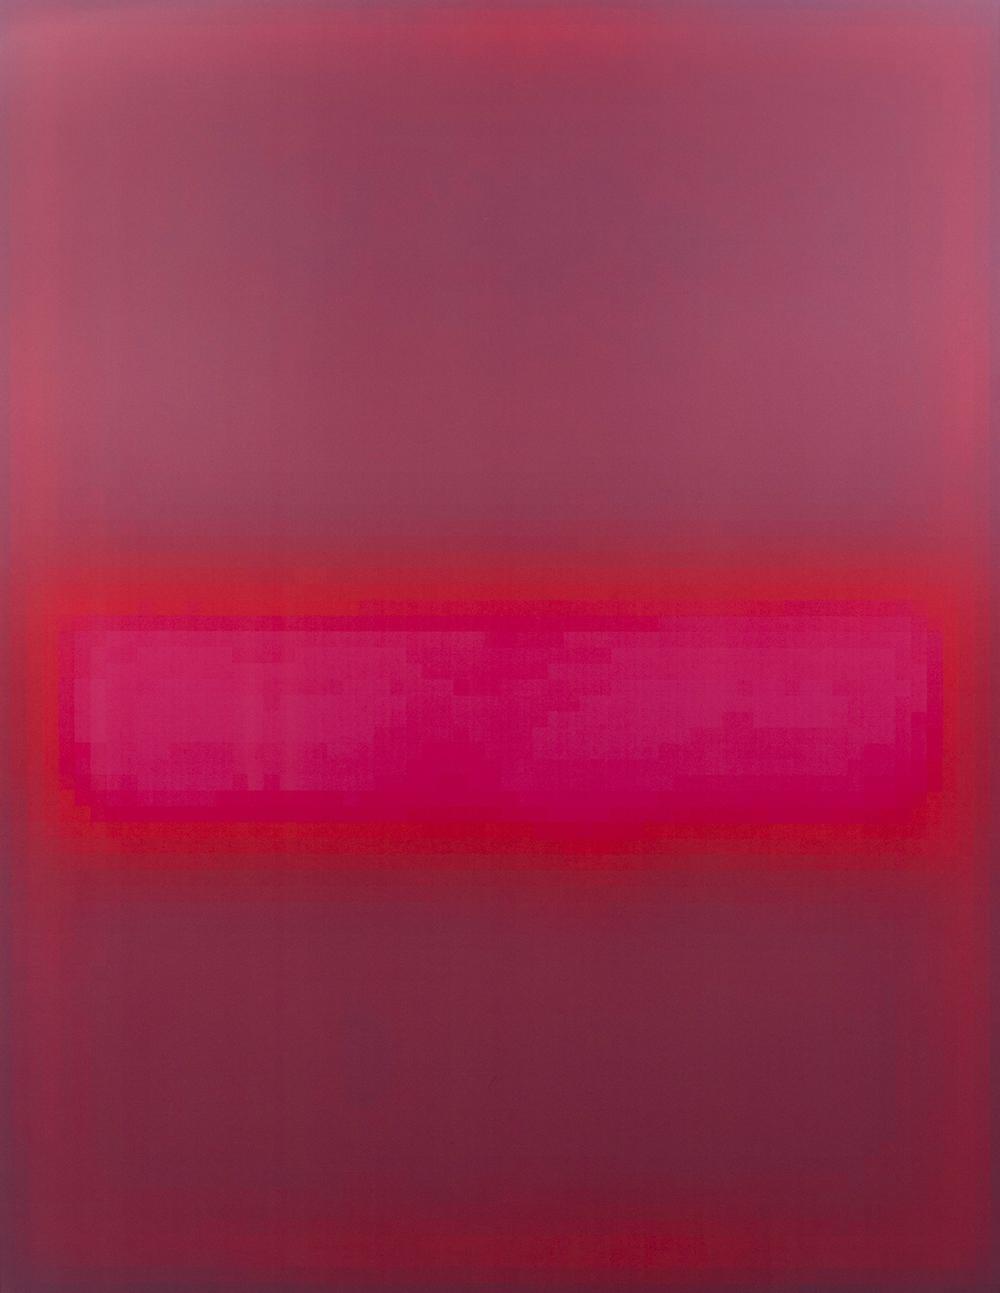 Mark Flood  Pink Glow, 2015  UV ink on canvas  108h x 84w in